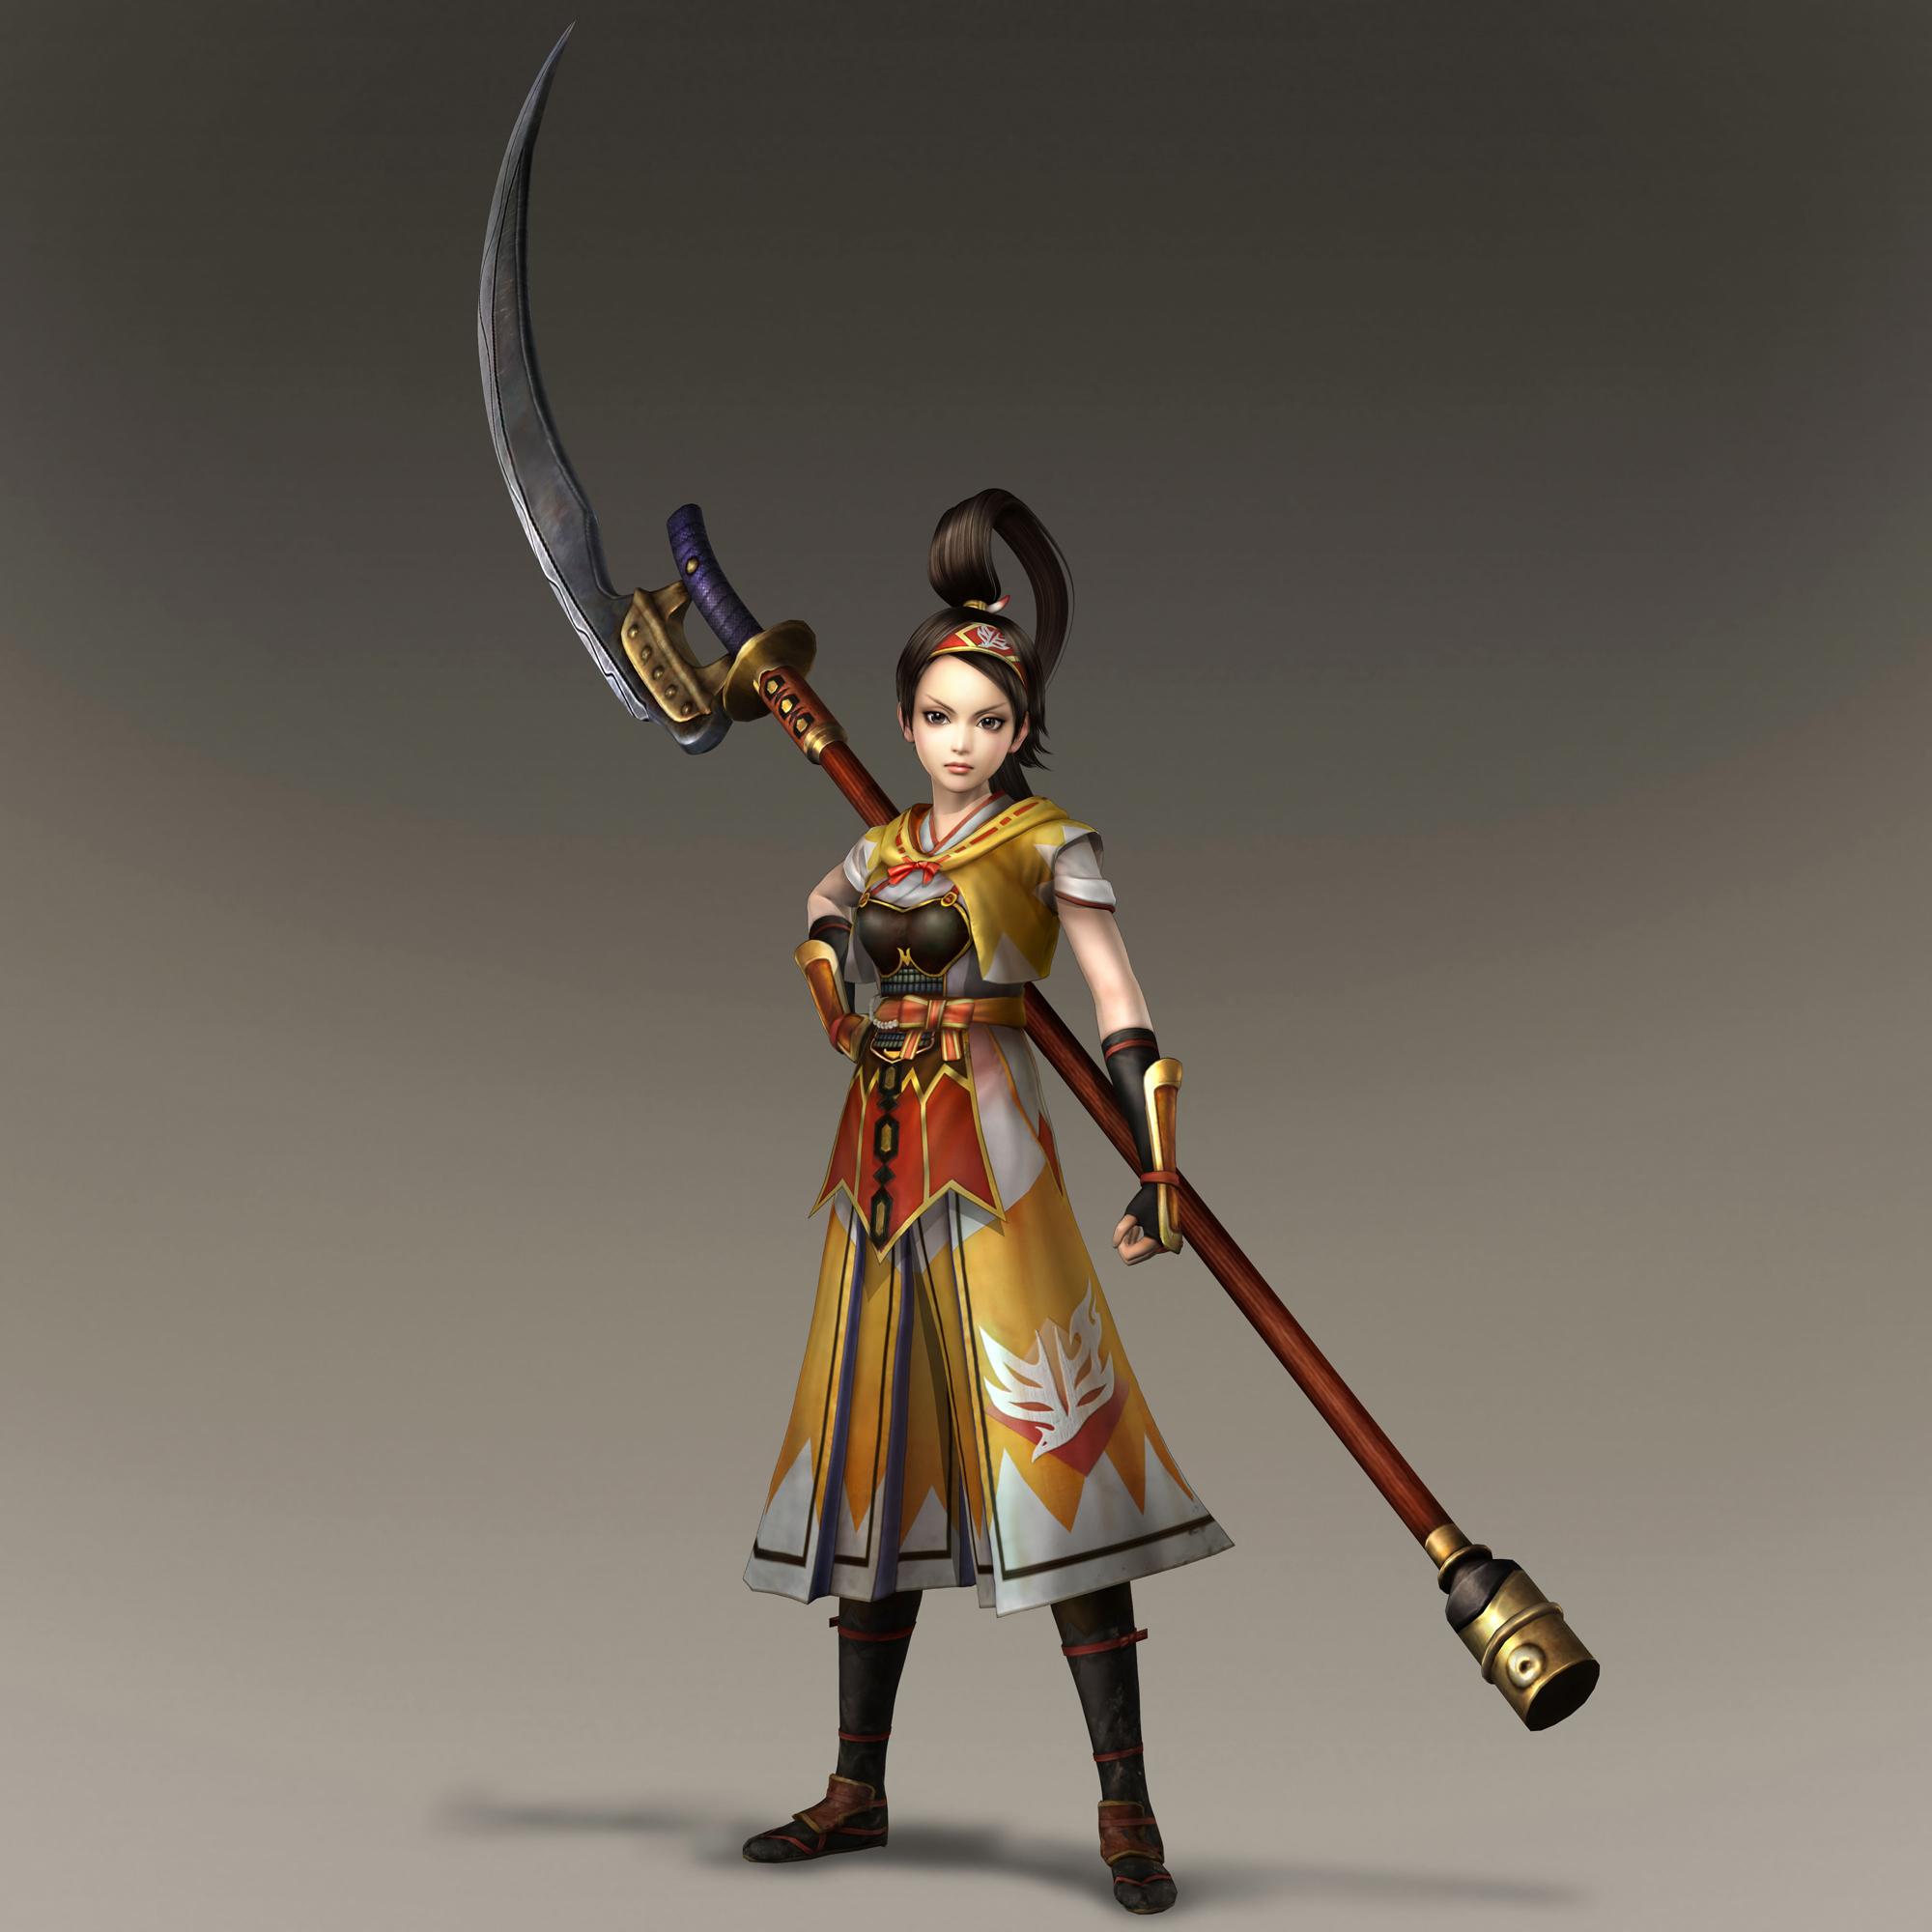 Guide Trophée Warriors Legends Of Troy: Image - Reki-toukiden.jpg